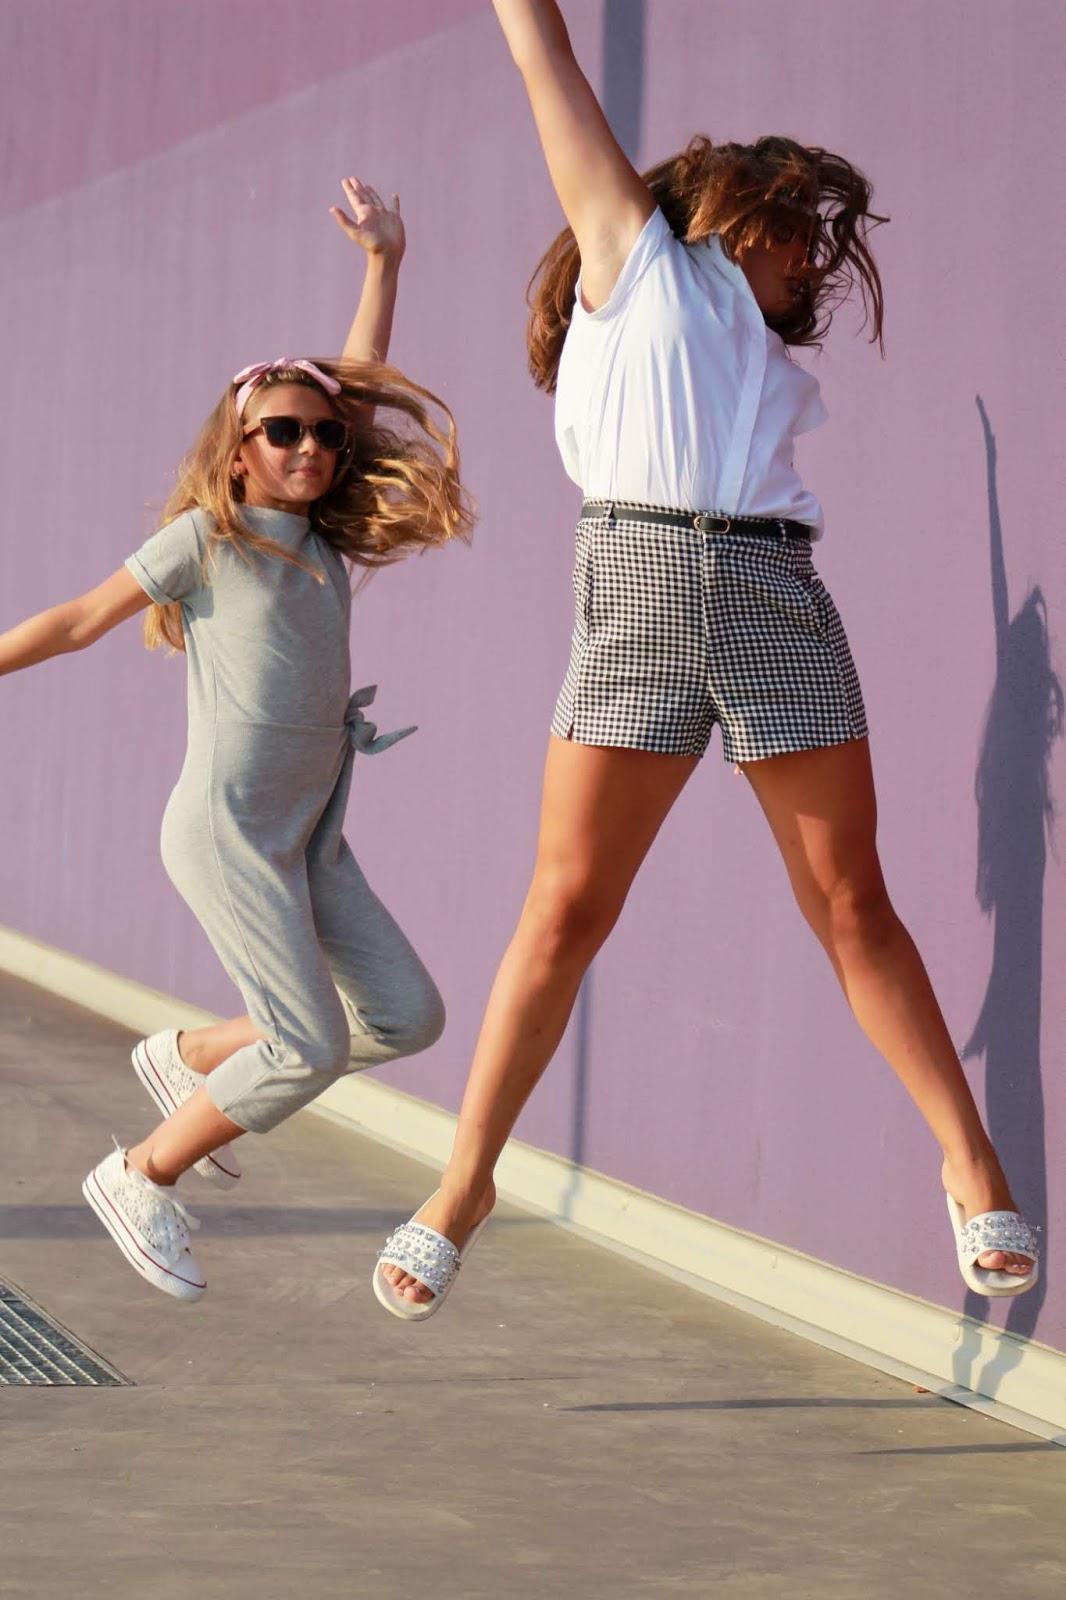 Eniwhere Fashion - Return to school